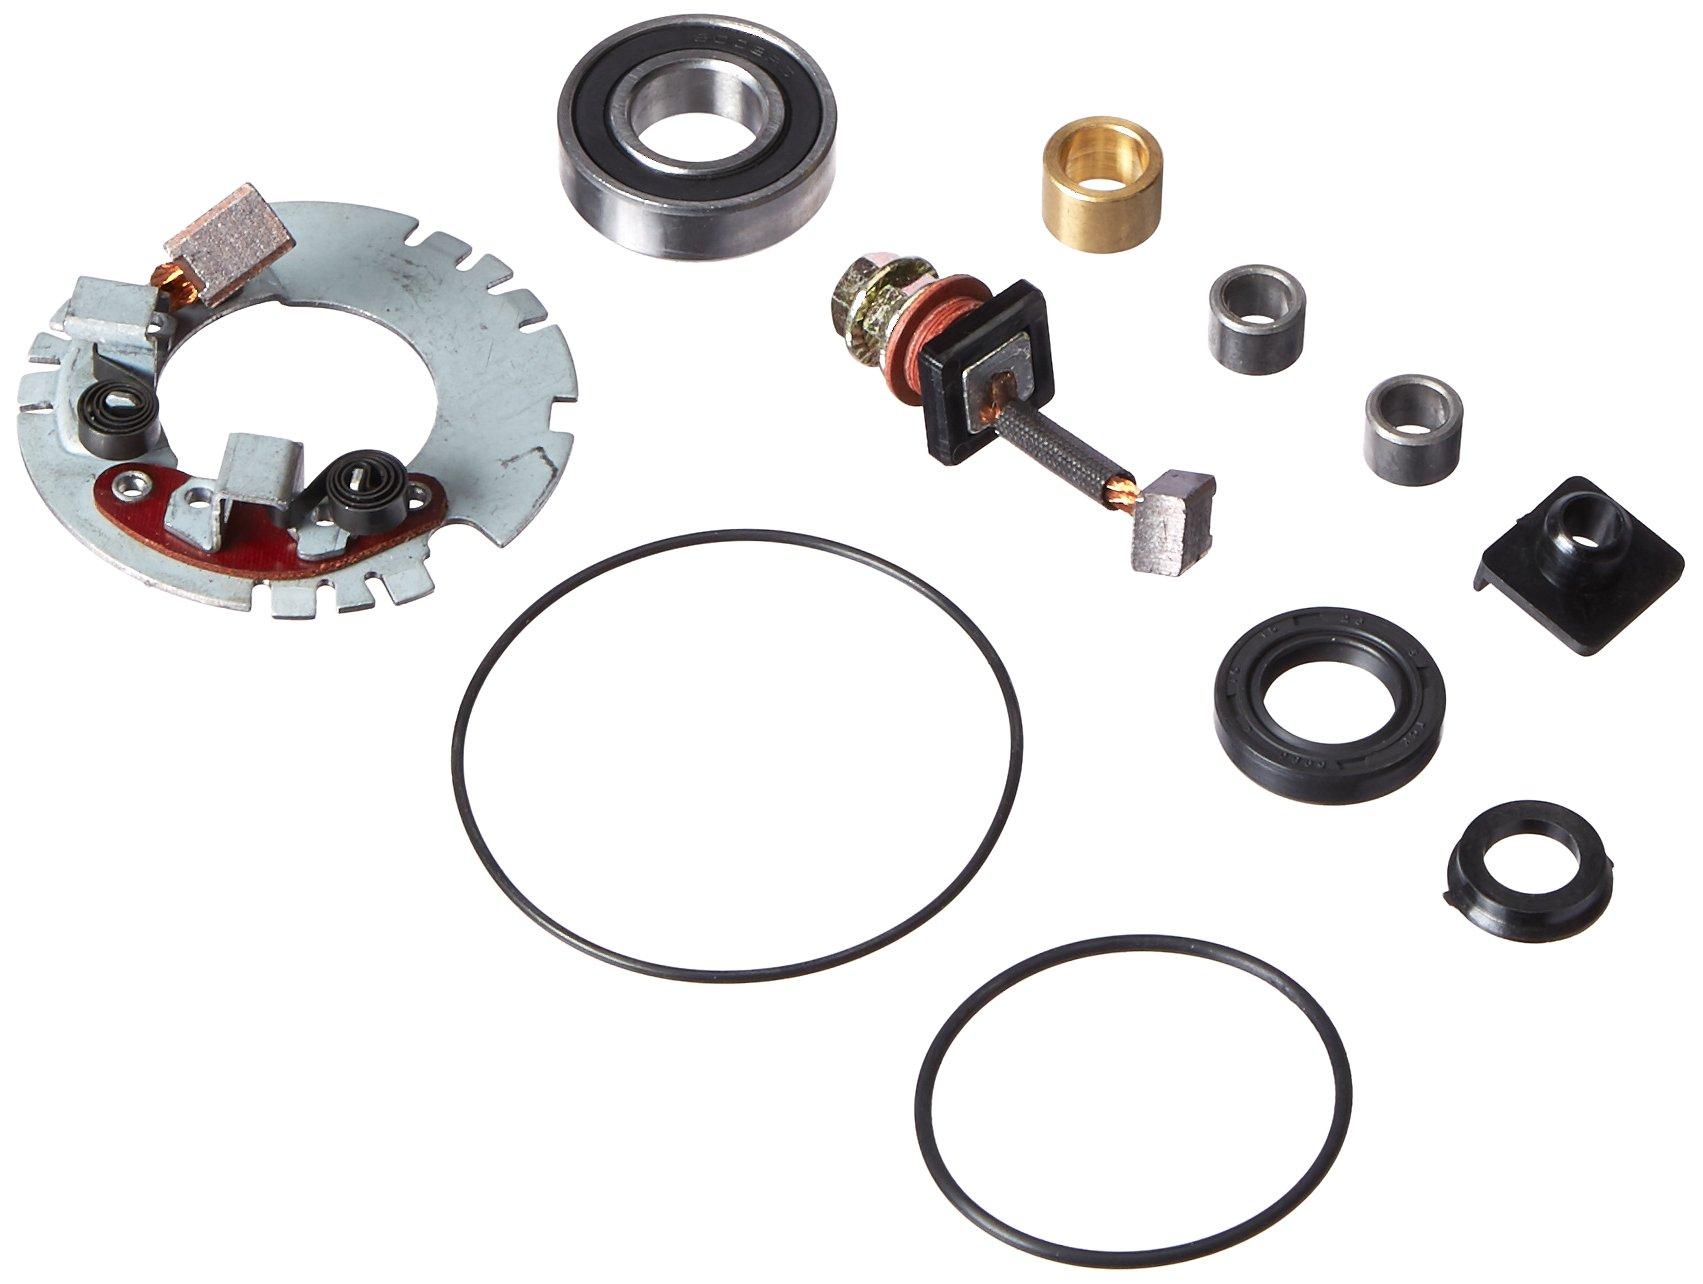 DB Electrical SMU9145  Starter Repair Kit for Yamaha M/C Xj650 Xj650L Xj650R Xj700 Maxim 80 81 82 83 84 85 86